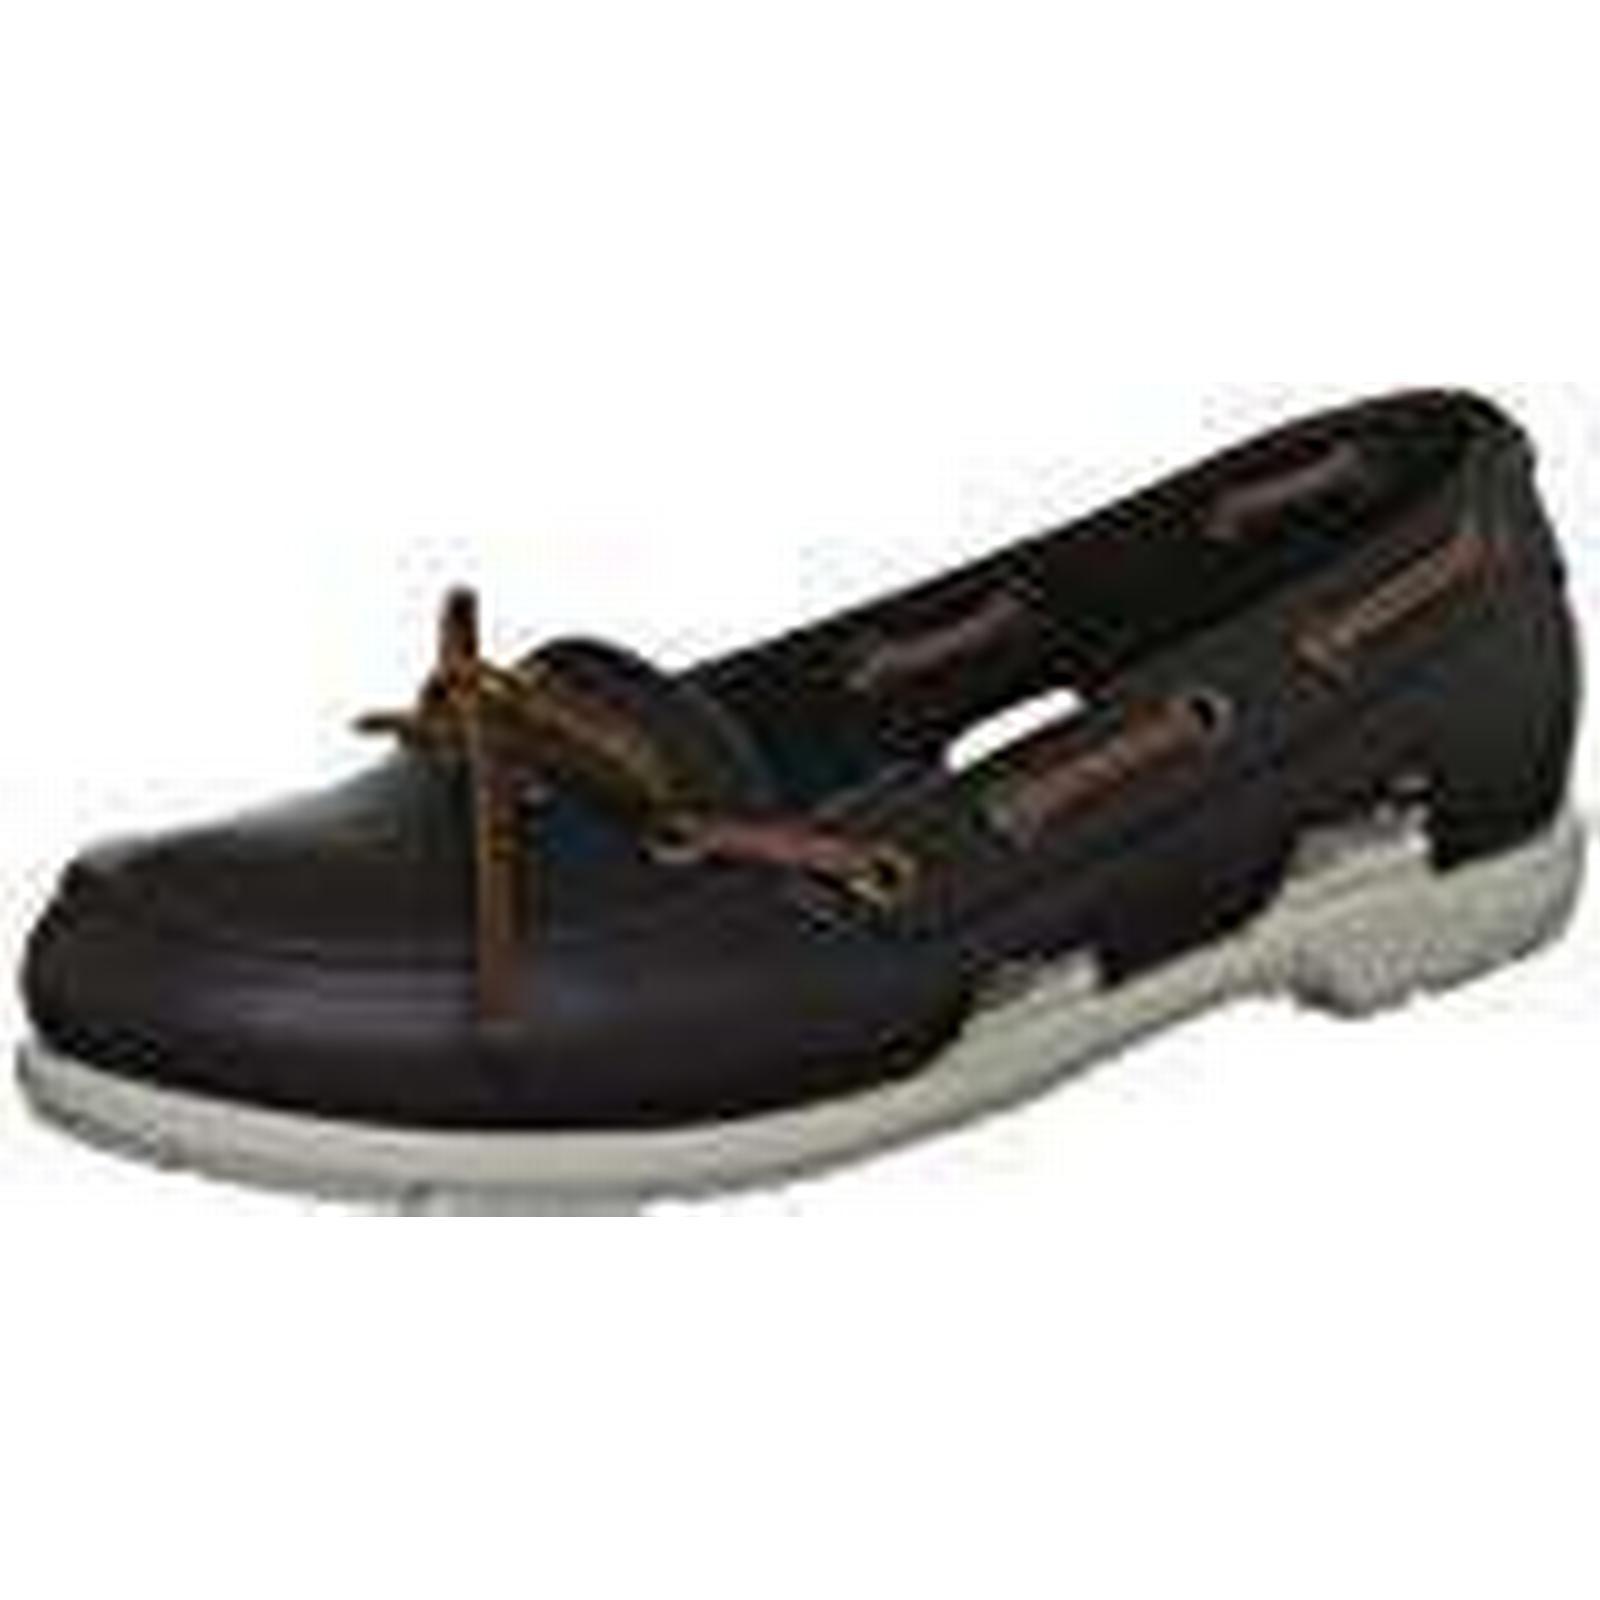 Crocs Women's Beach Line Boat Brown Shoe Women Boat Shoes, Brown Boat (Espresso/Stucco), 3 UK (5 US) f10583